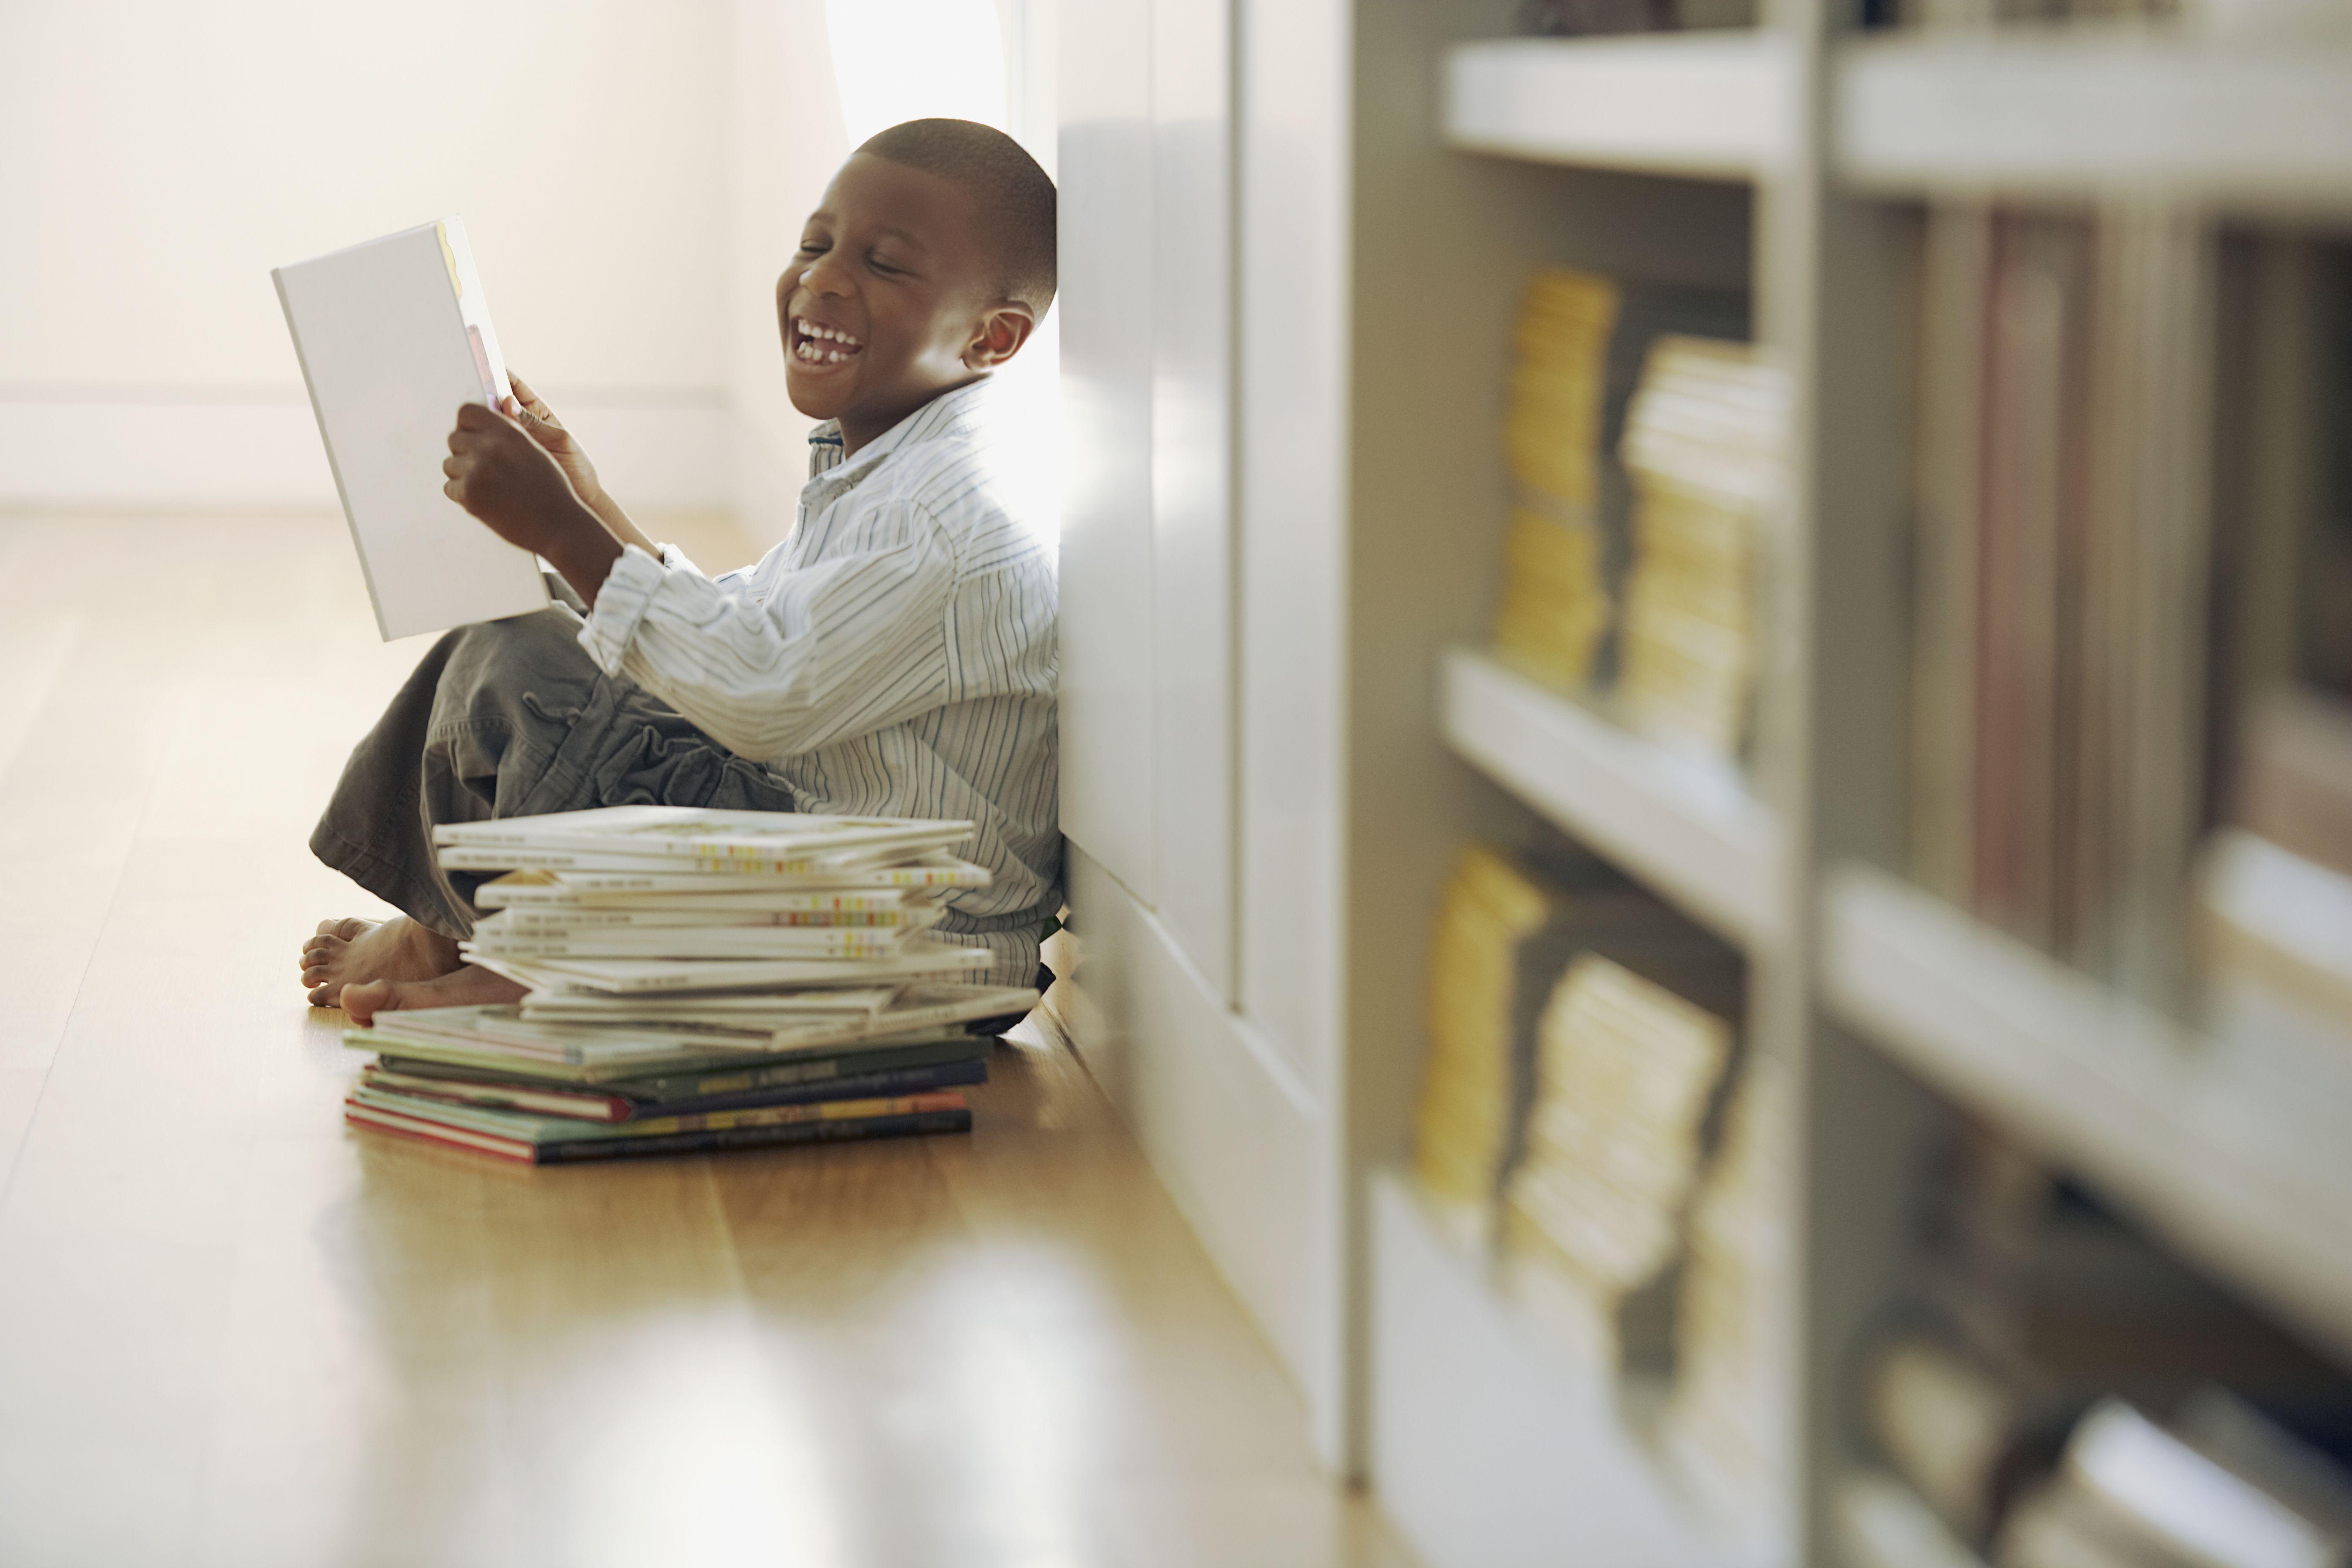 Young boy laughs at a storybook